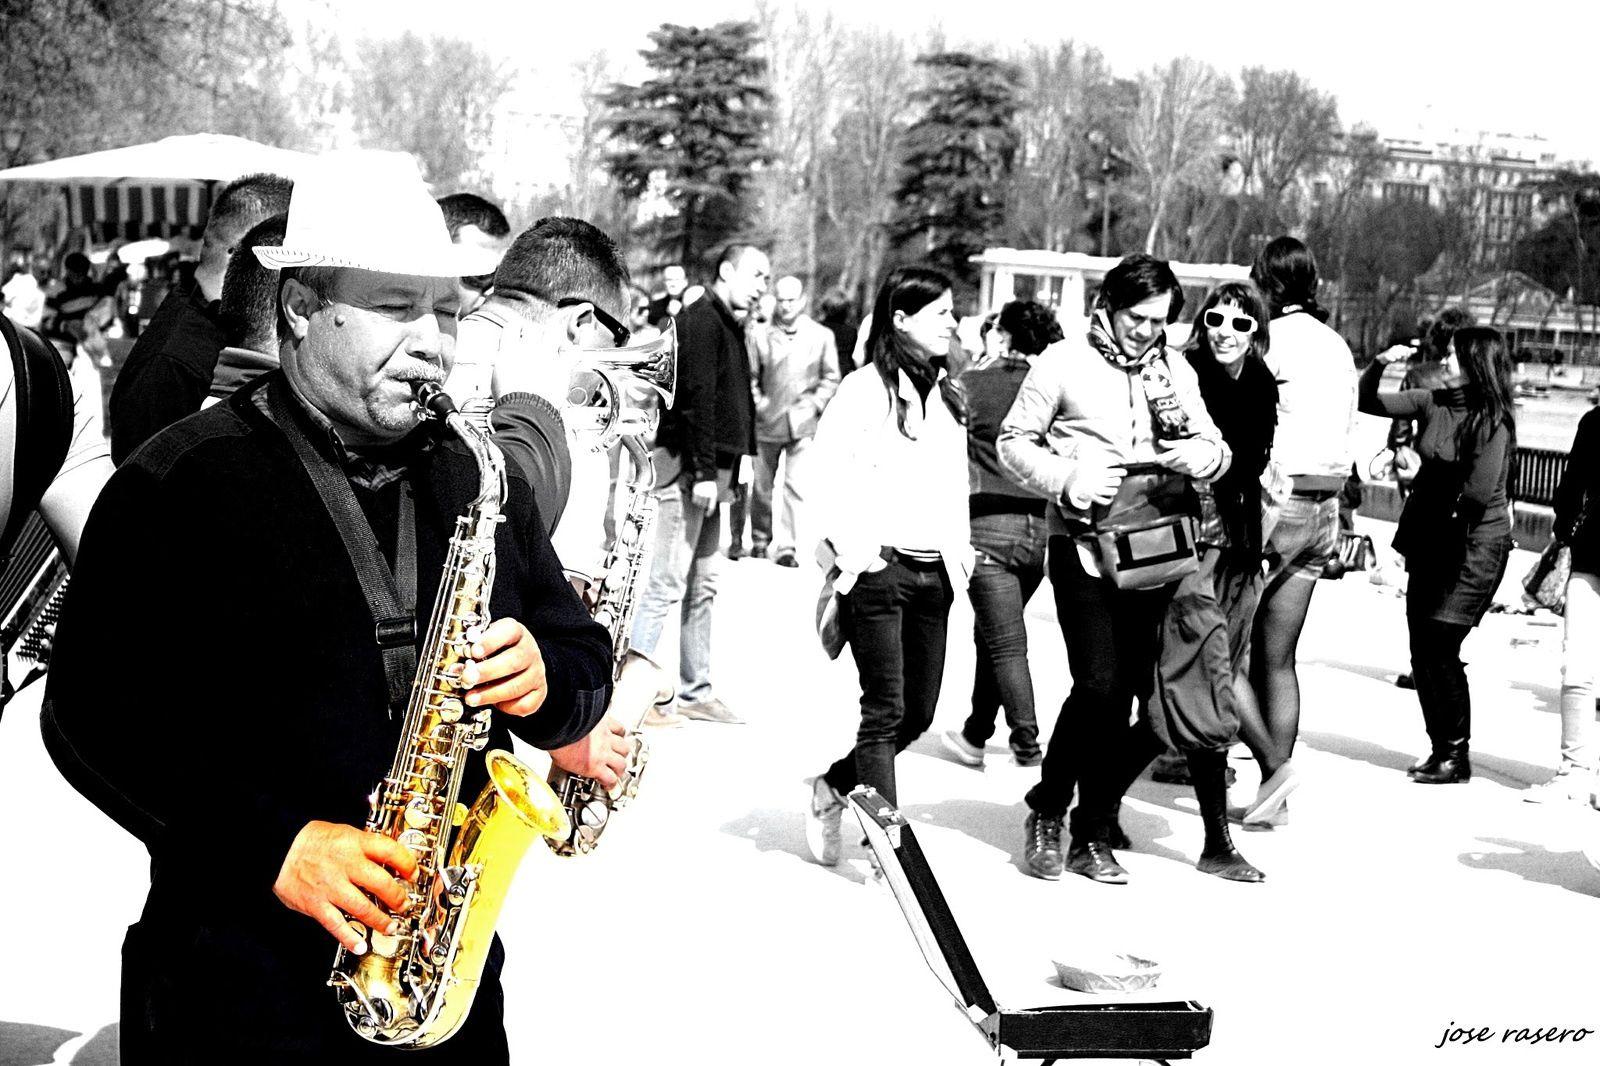 'Musicians'